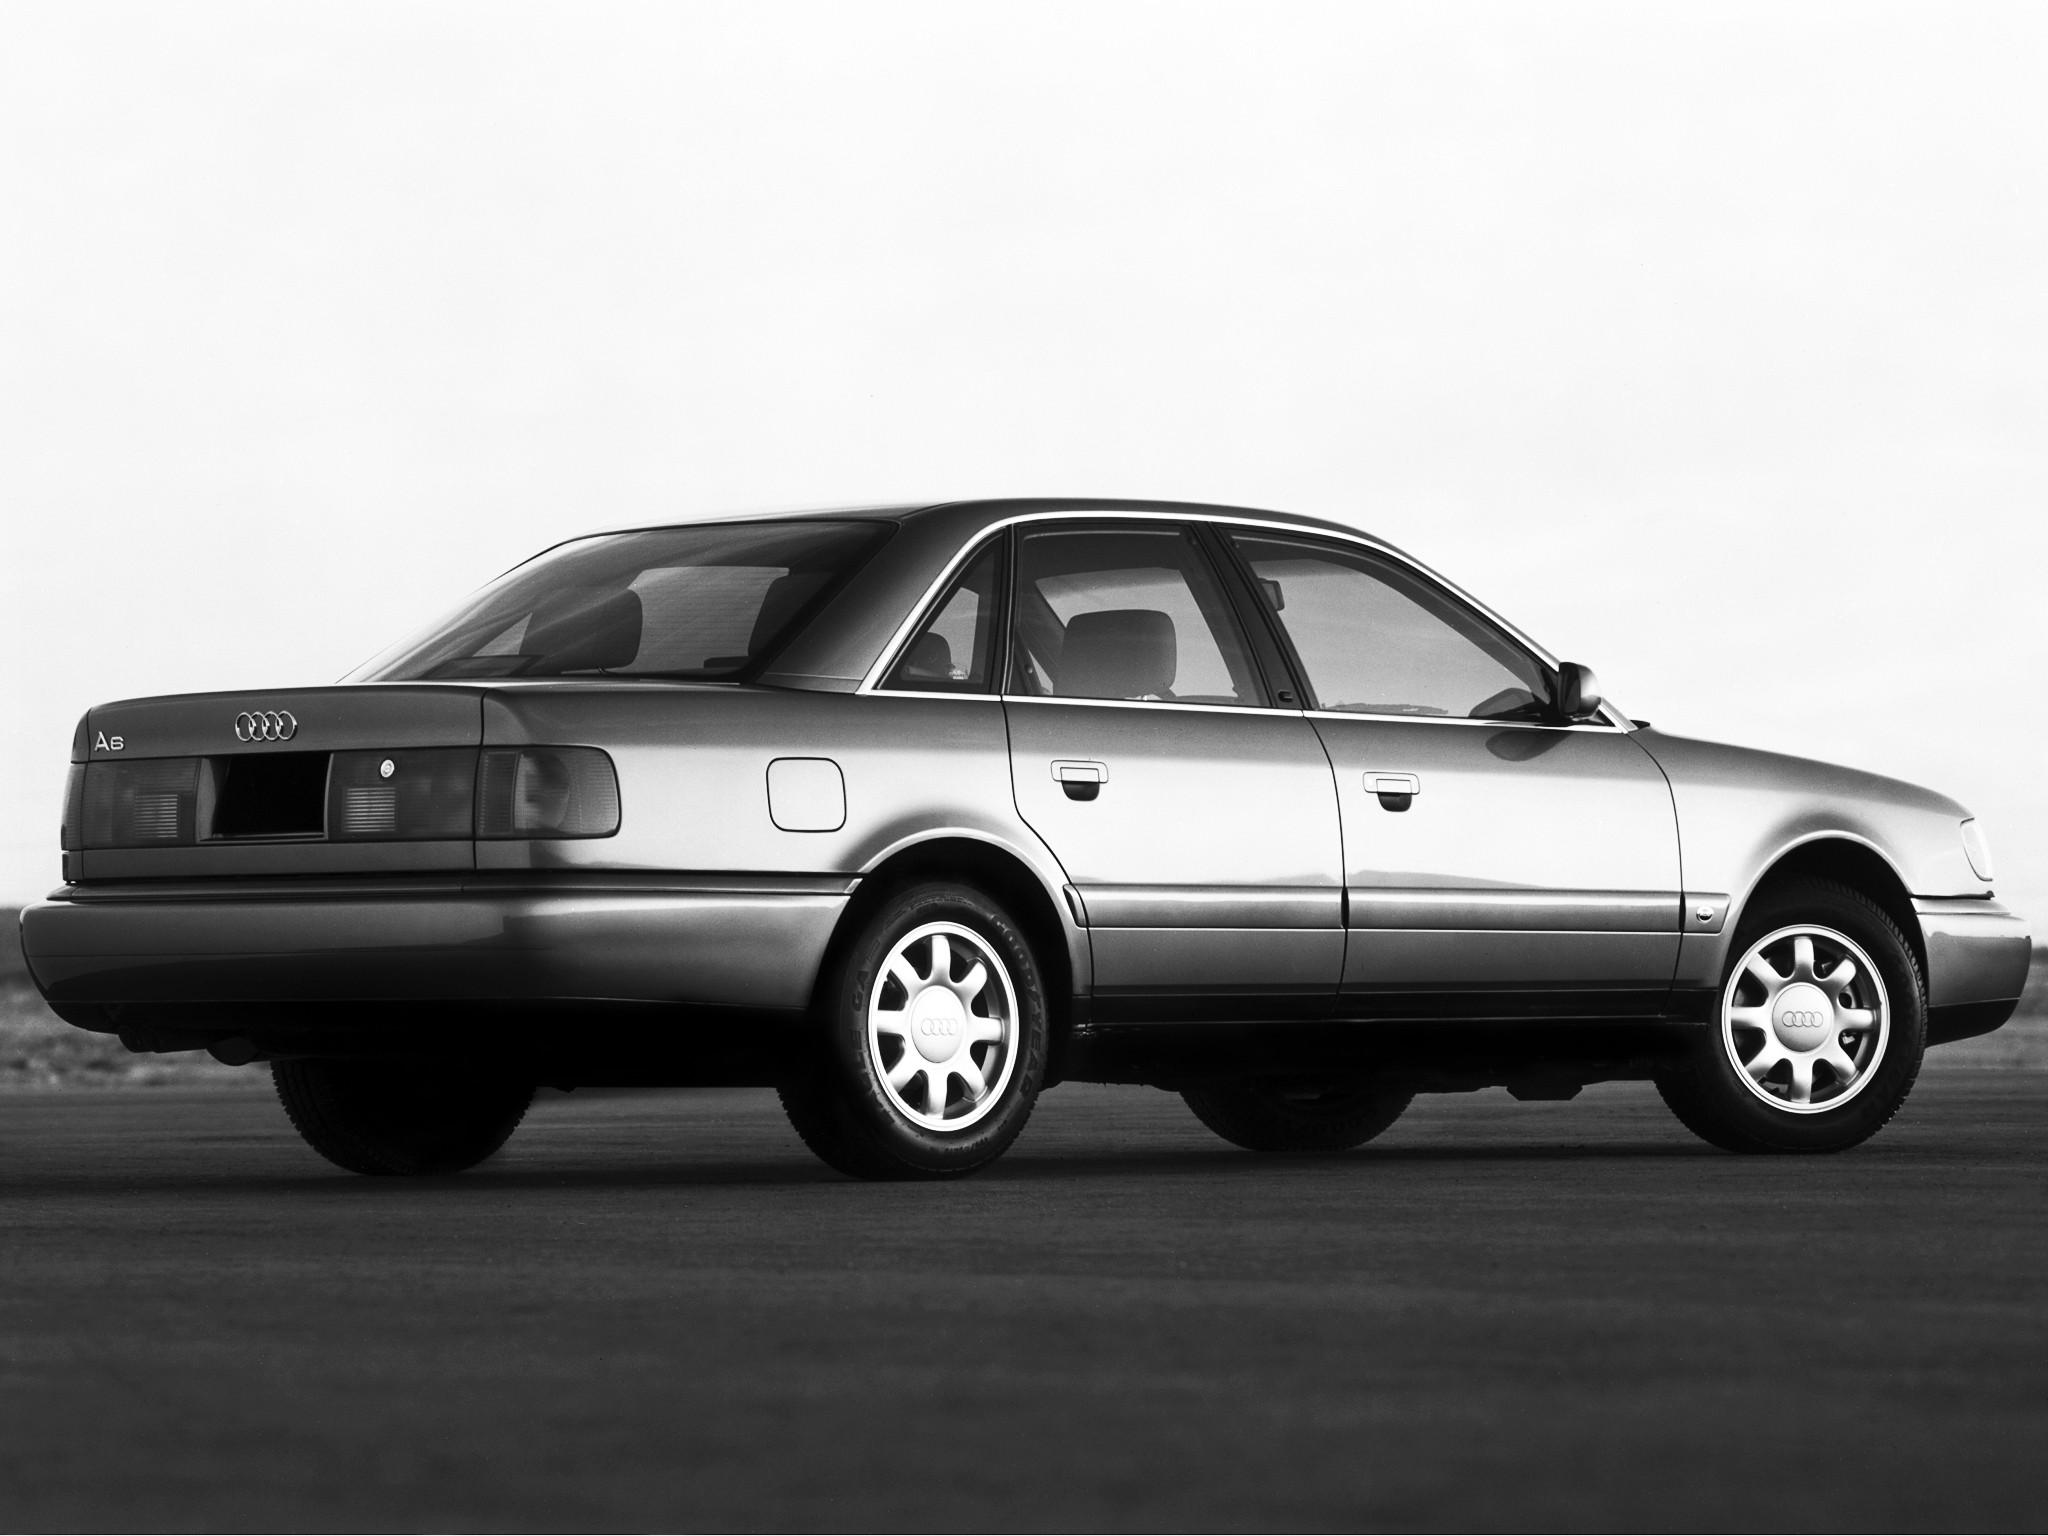 Audi A6 I (C4) 1994 - 1997 Sedan #3